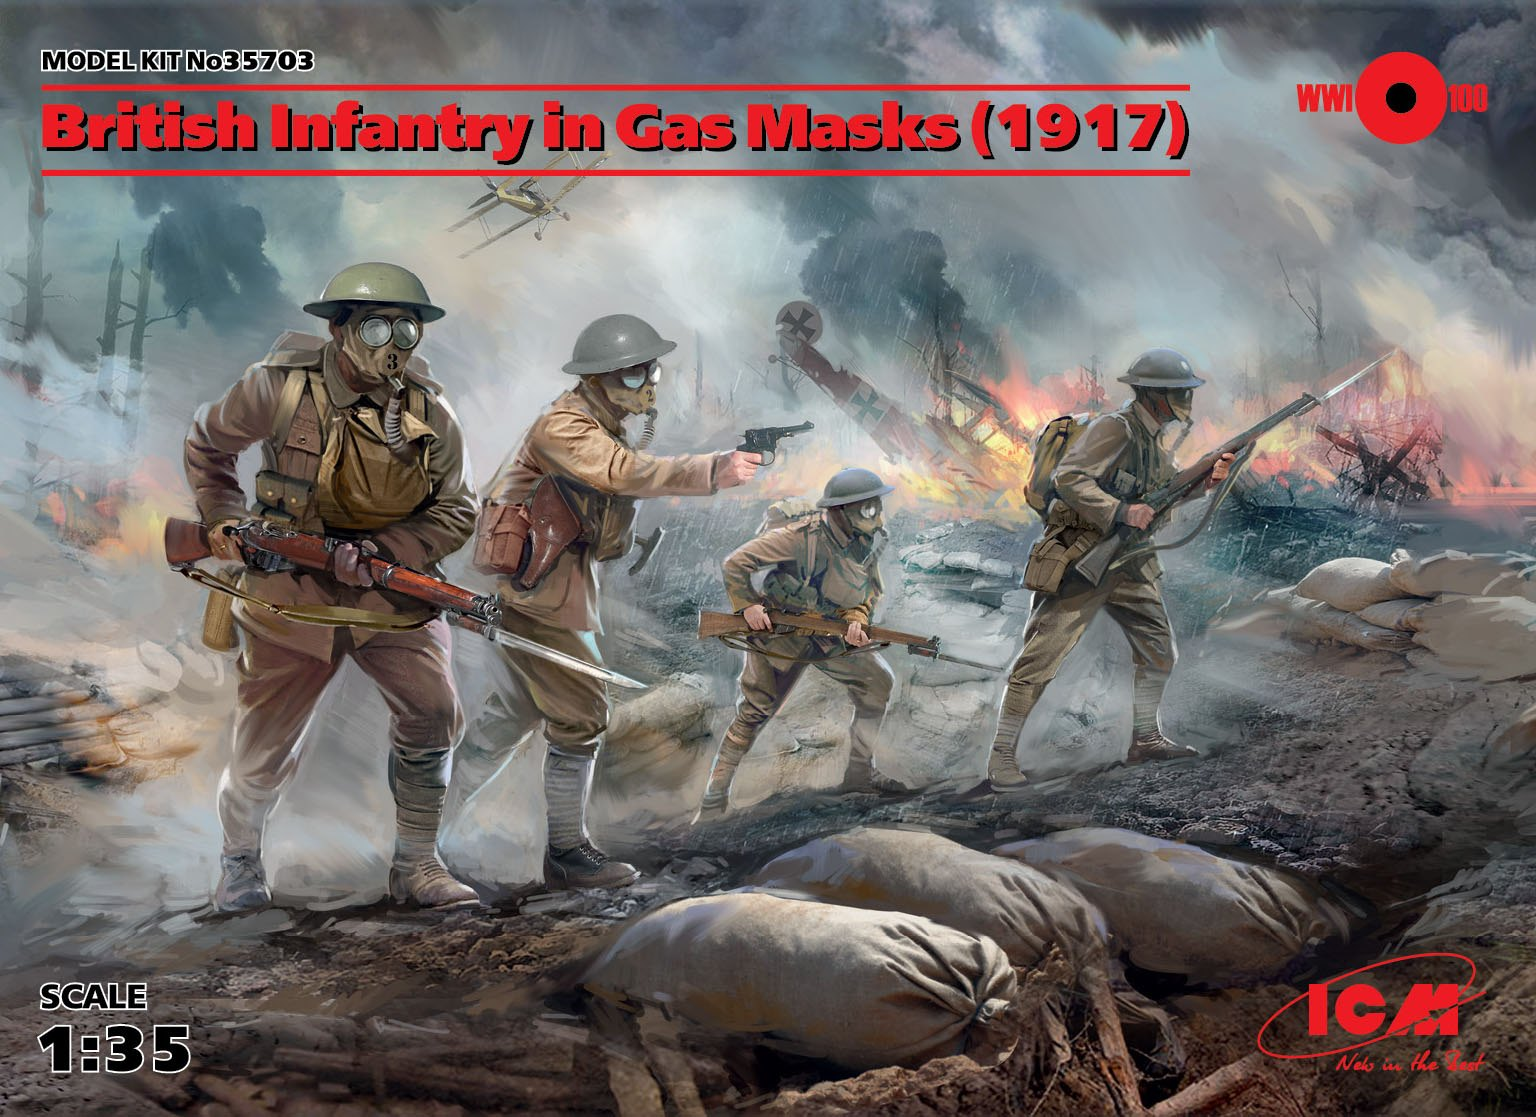 ICM British Infantry in Gas Masks (1917) (4 figures)